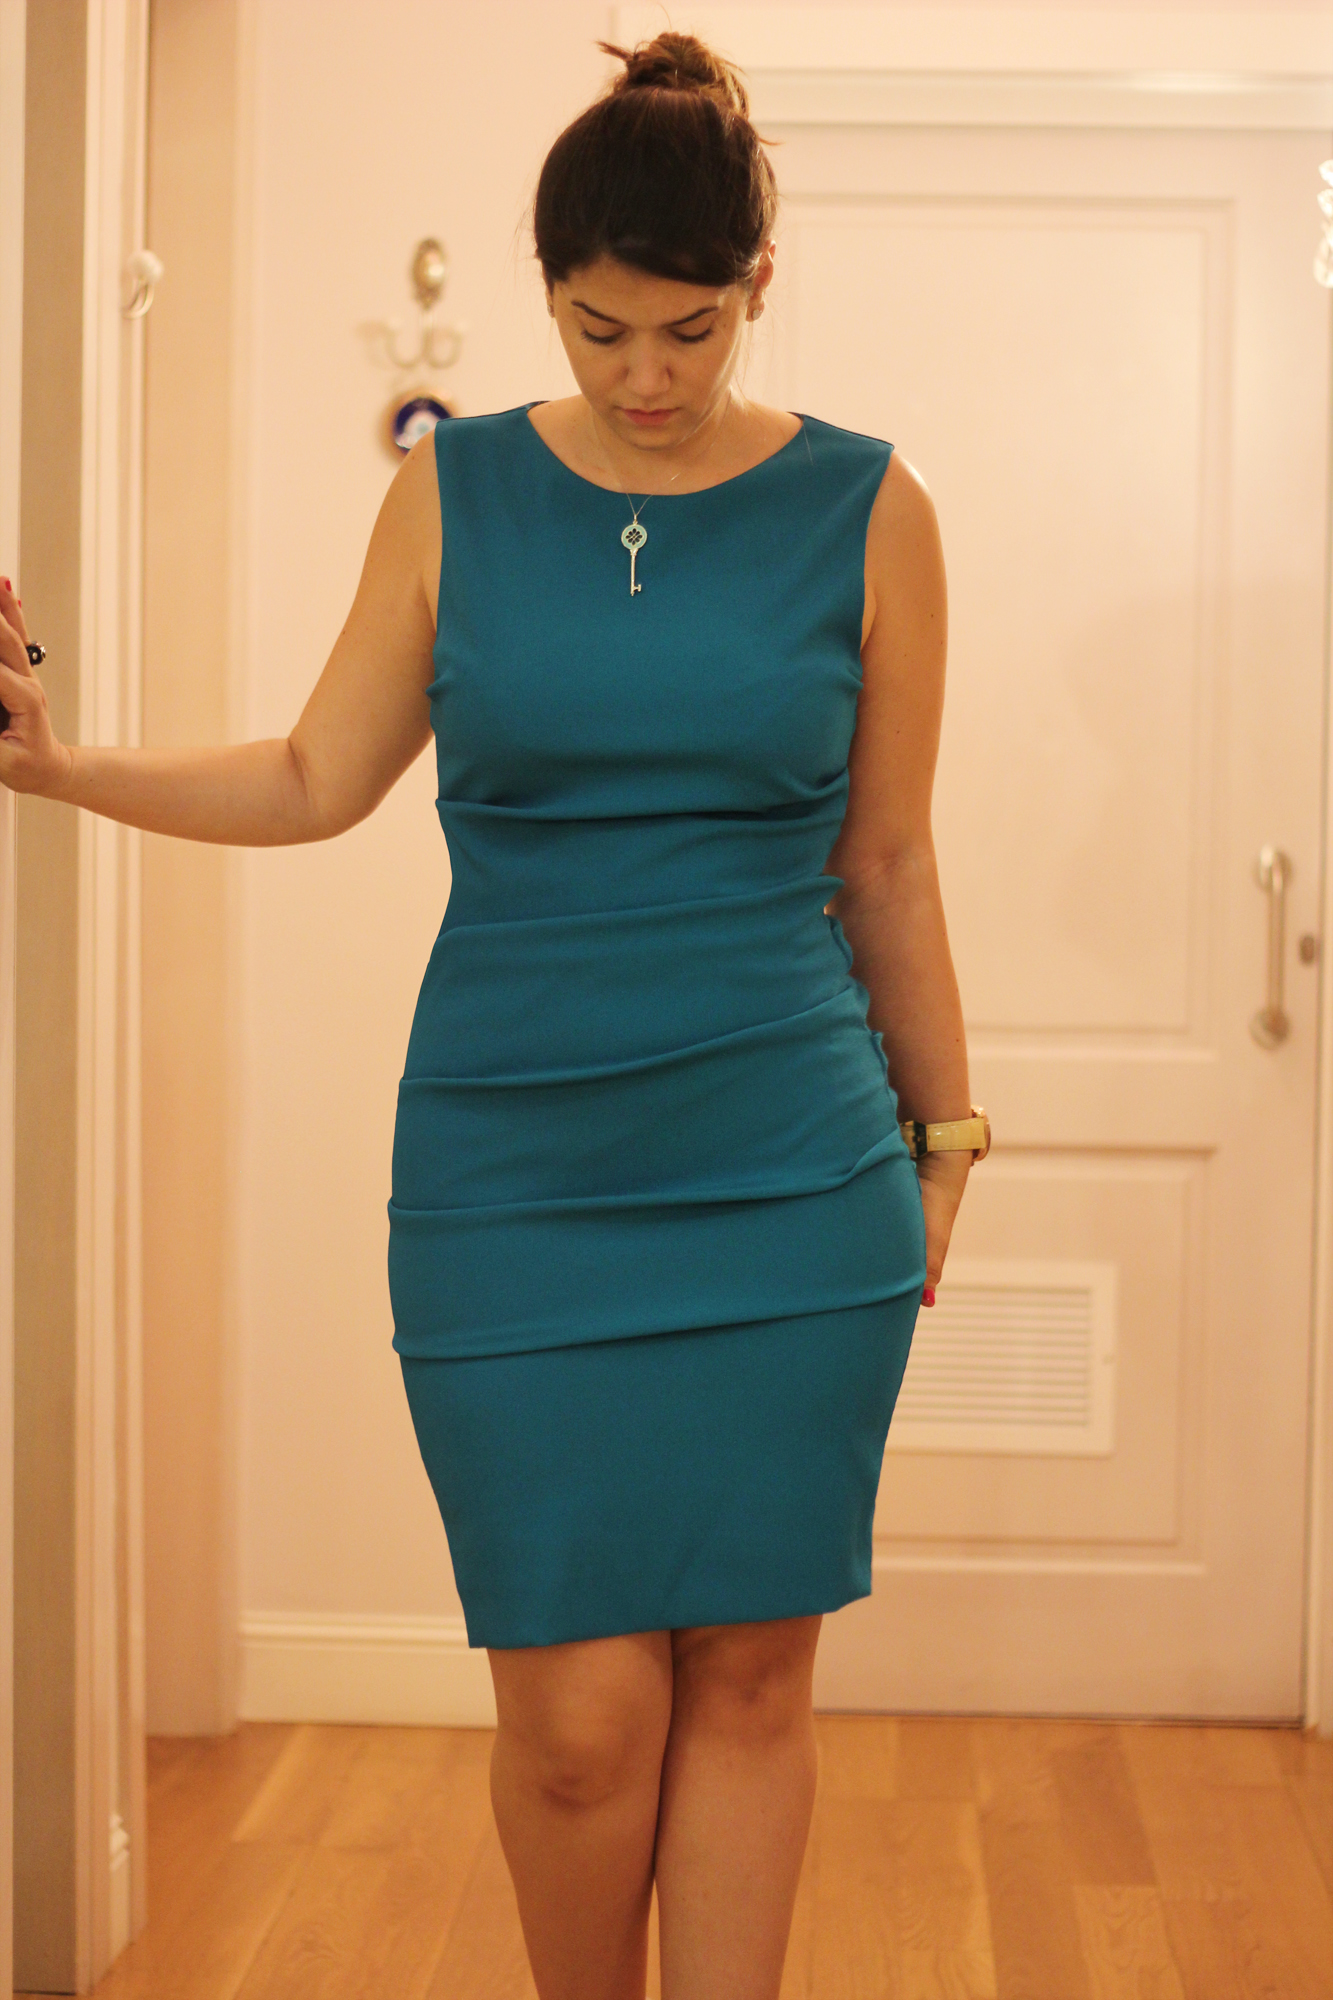 Zapatos para vestido azul aqua